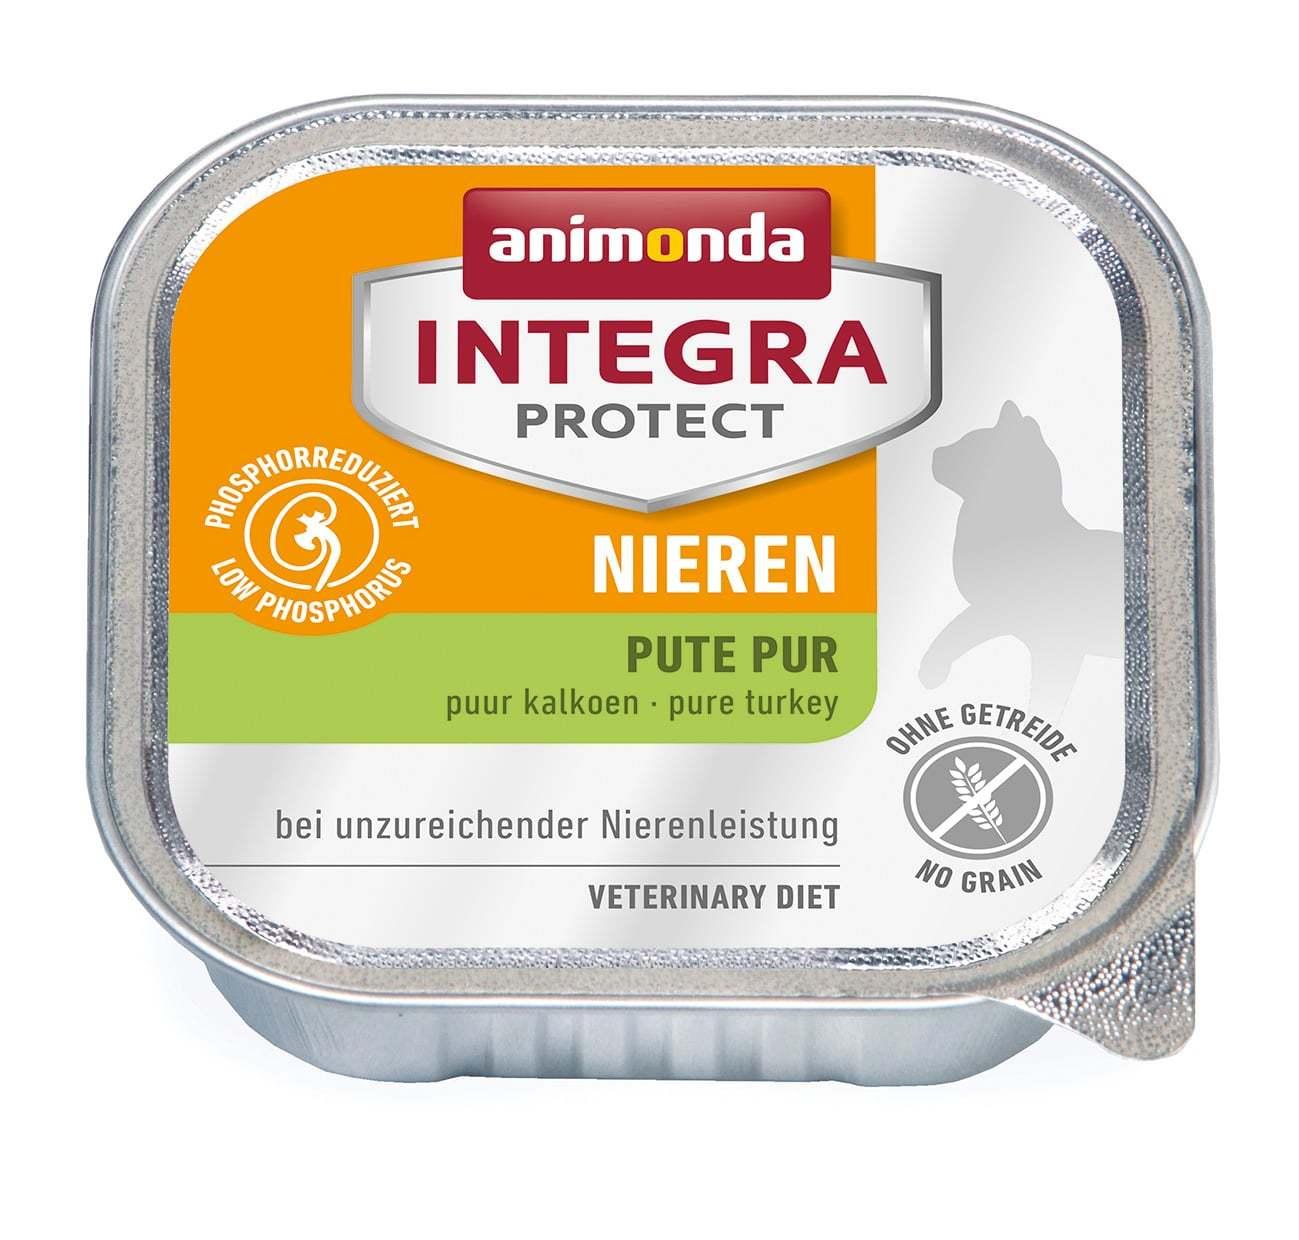 Купить Animonda Integra Protect Cat (ламистер) Nieren (RENAL) pure Turkey для кошек